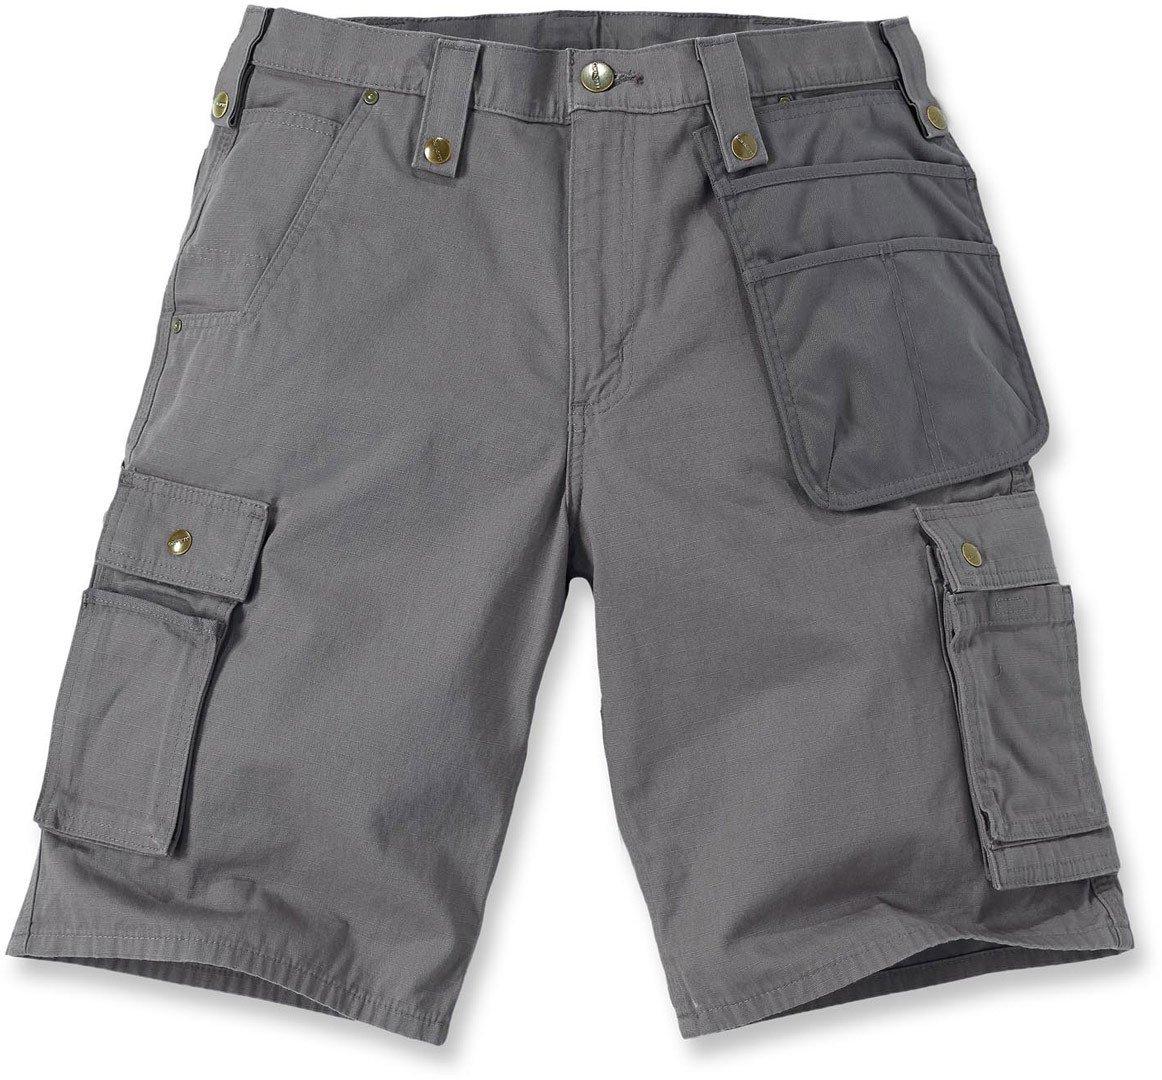 Größel 039 Carhartt Emea Multipocket Ripstop Short - Workwear Shorts